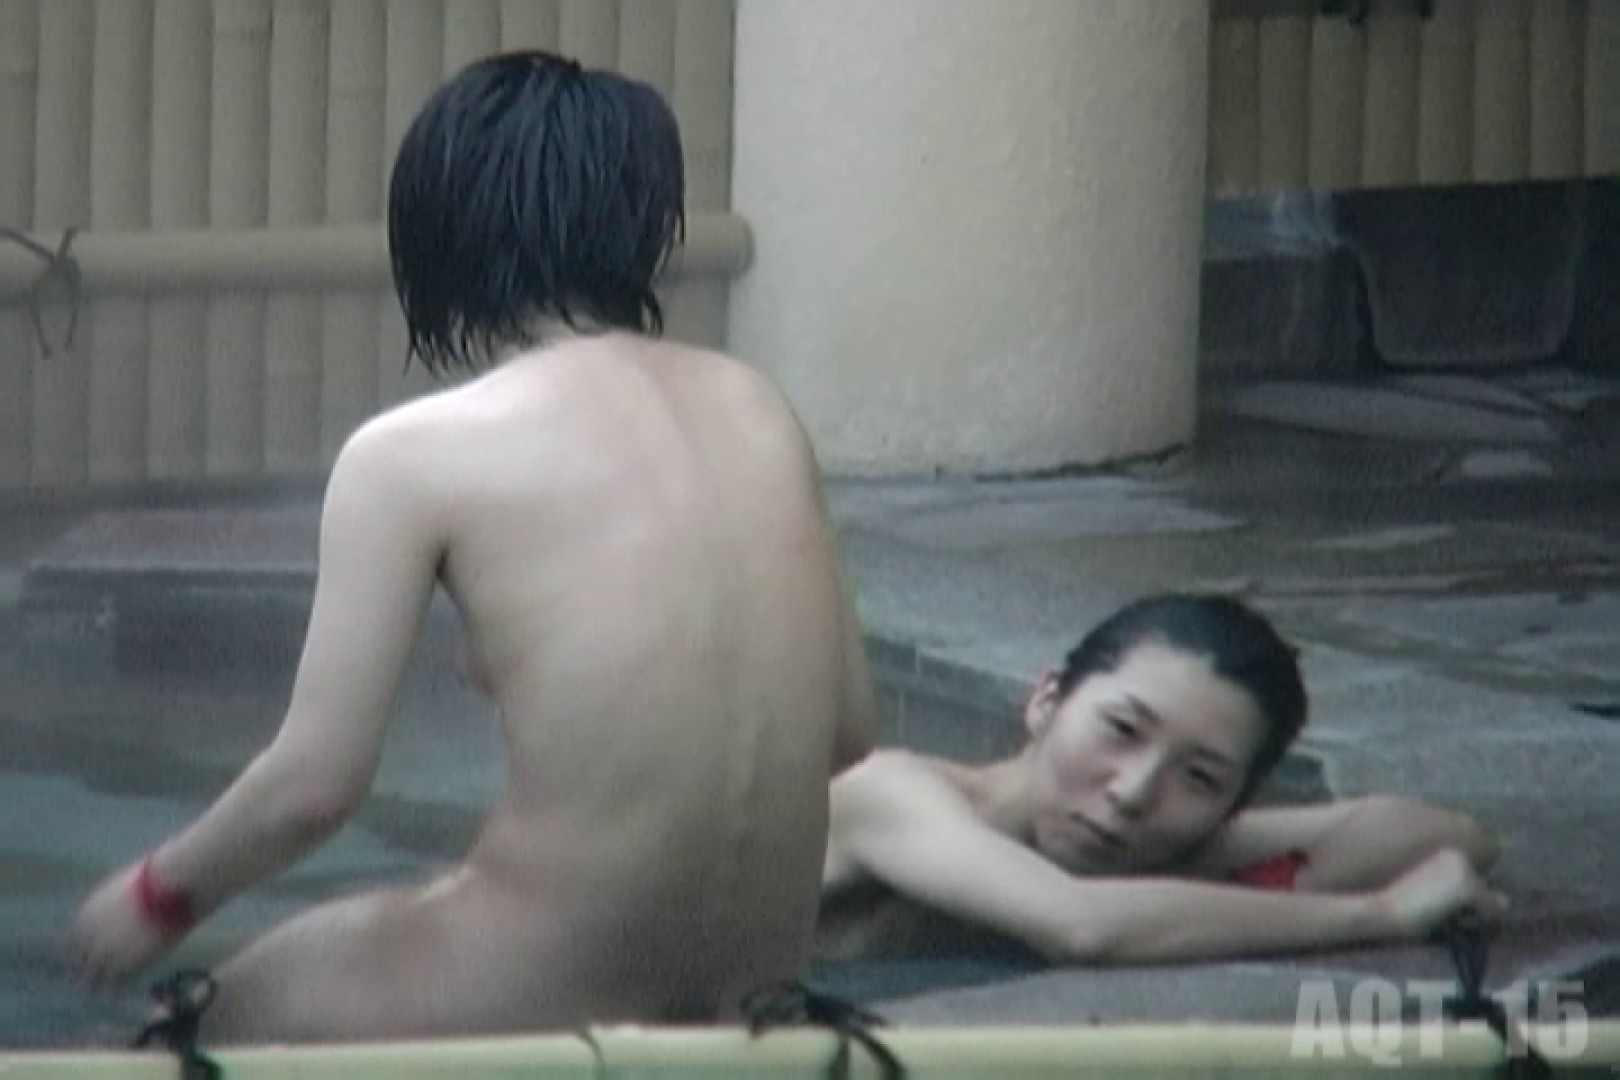 Aquaな露天風呂Vol.837 盗撮映像  107Pix 11